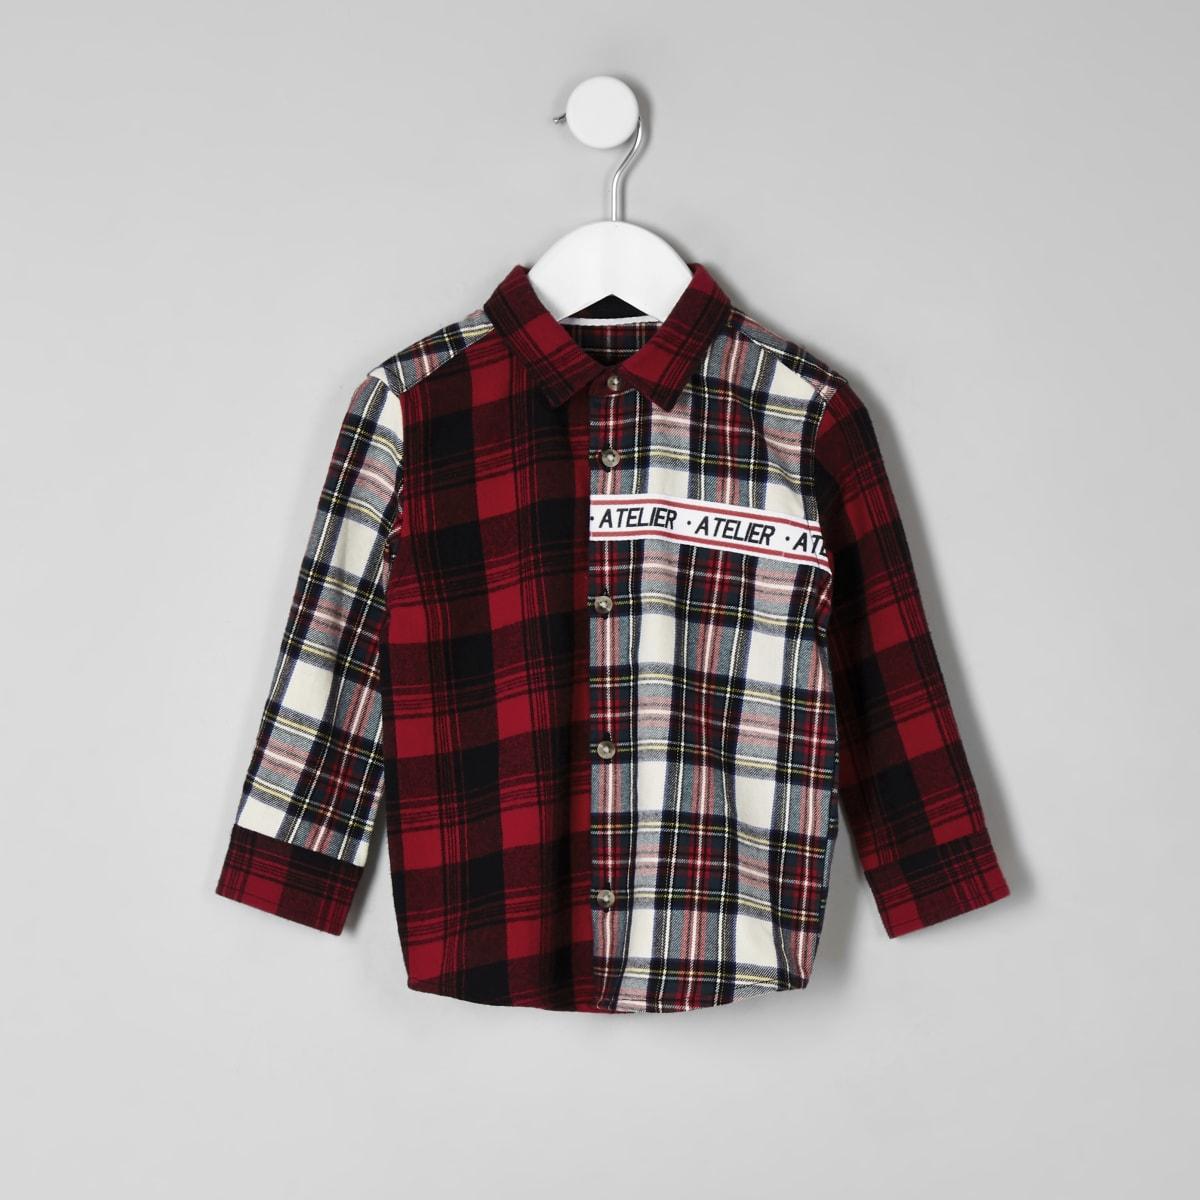 Mini boys red 'Atelier' check shirt